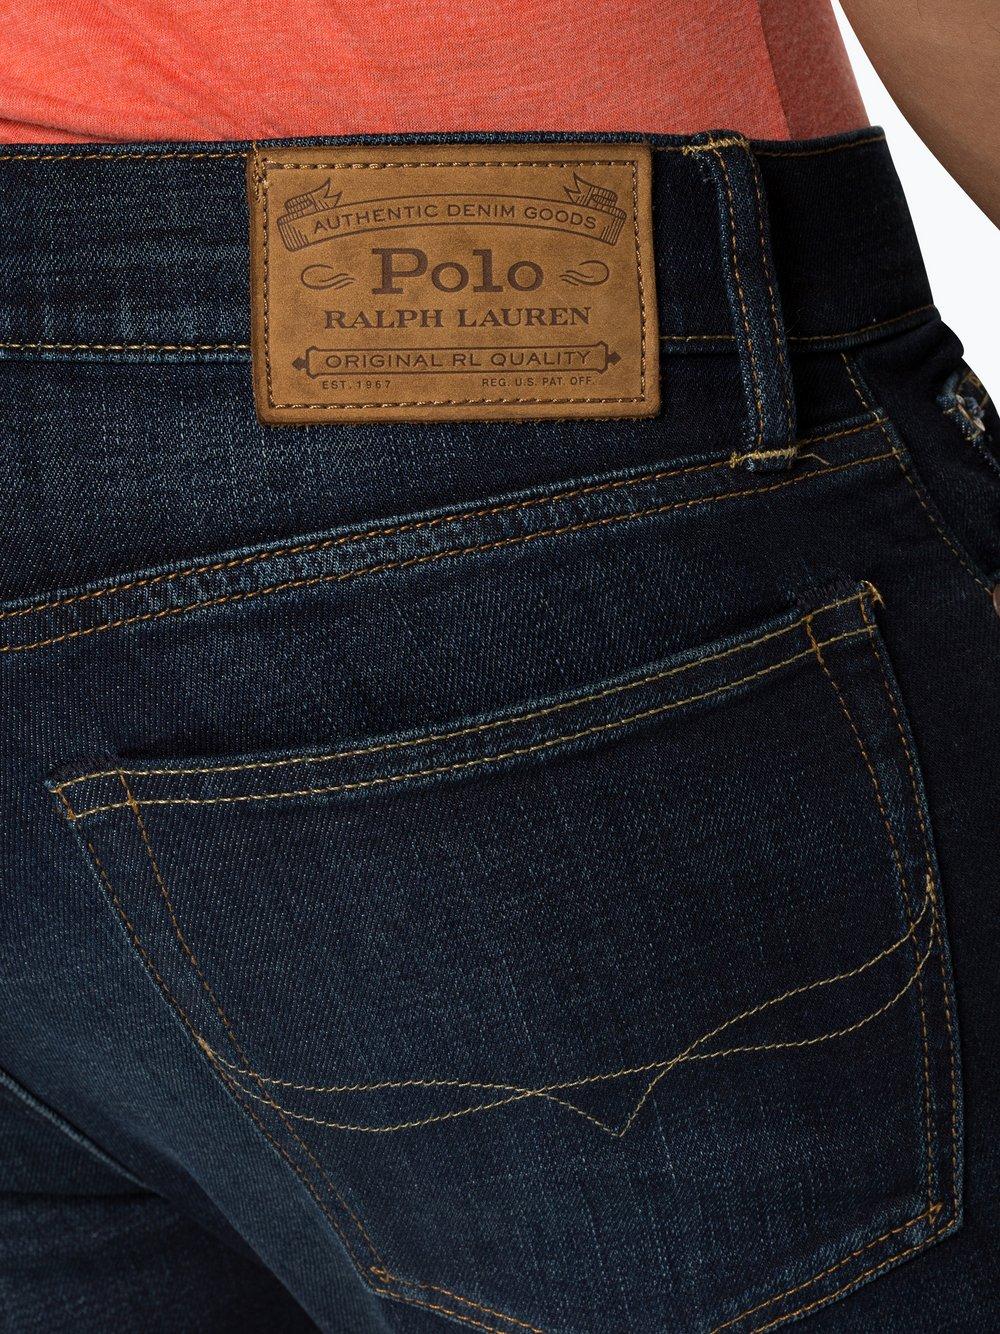 official photos c6227 640bd Polo Ralph Lauren Herren Jeans - Slim Fit online kaufen ...